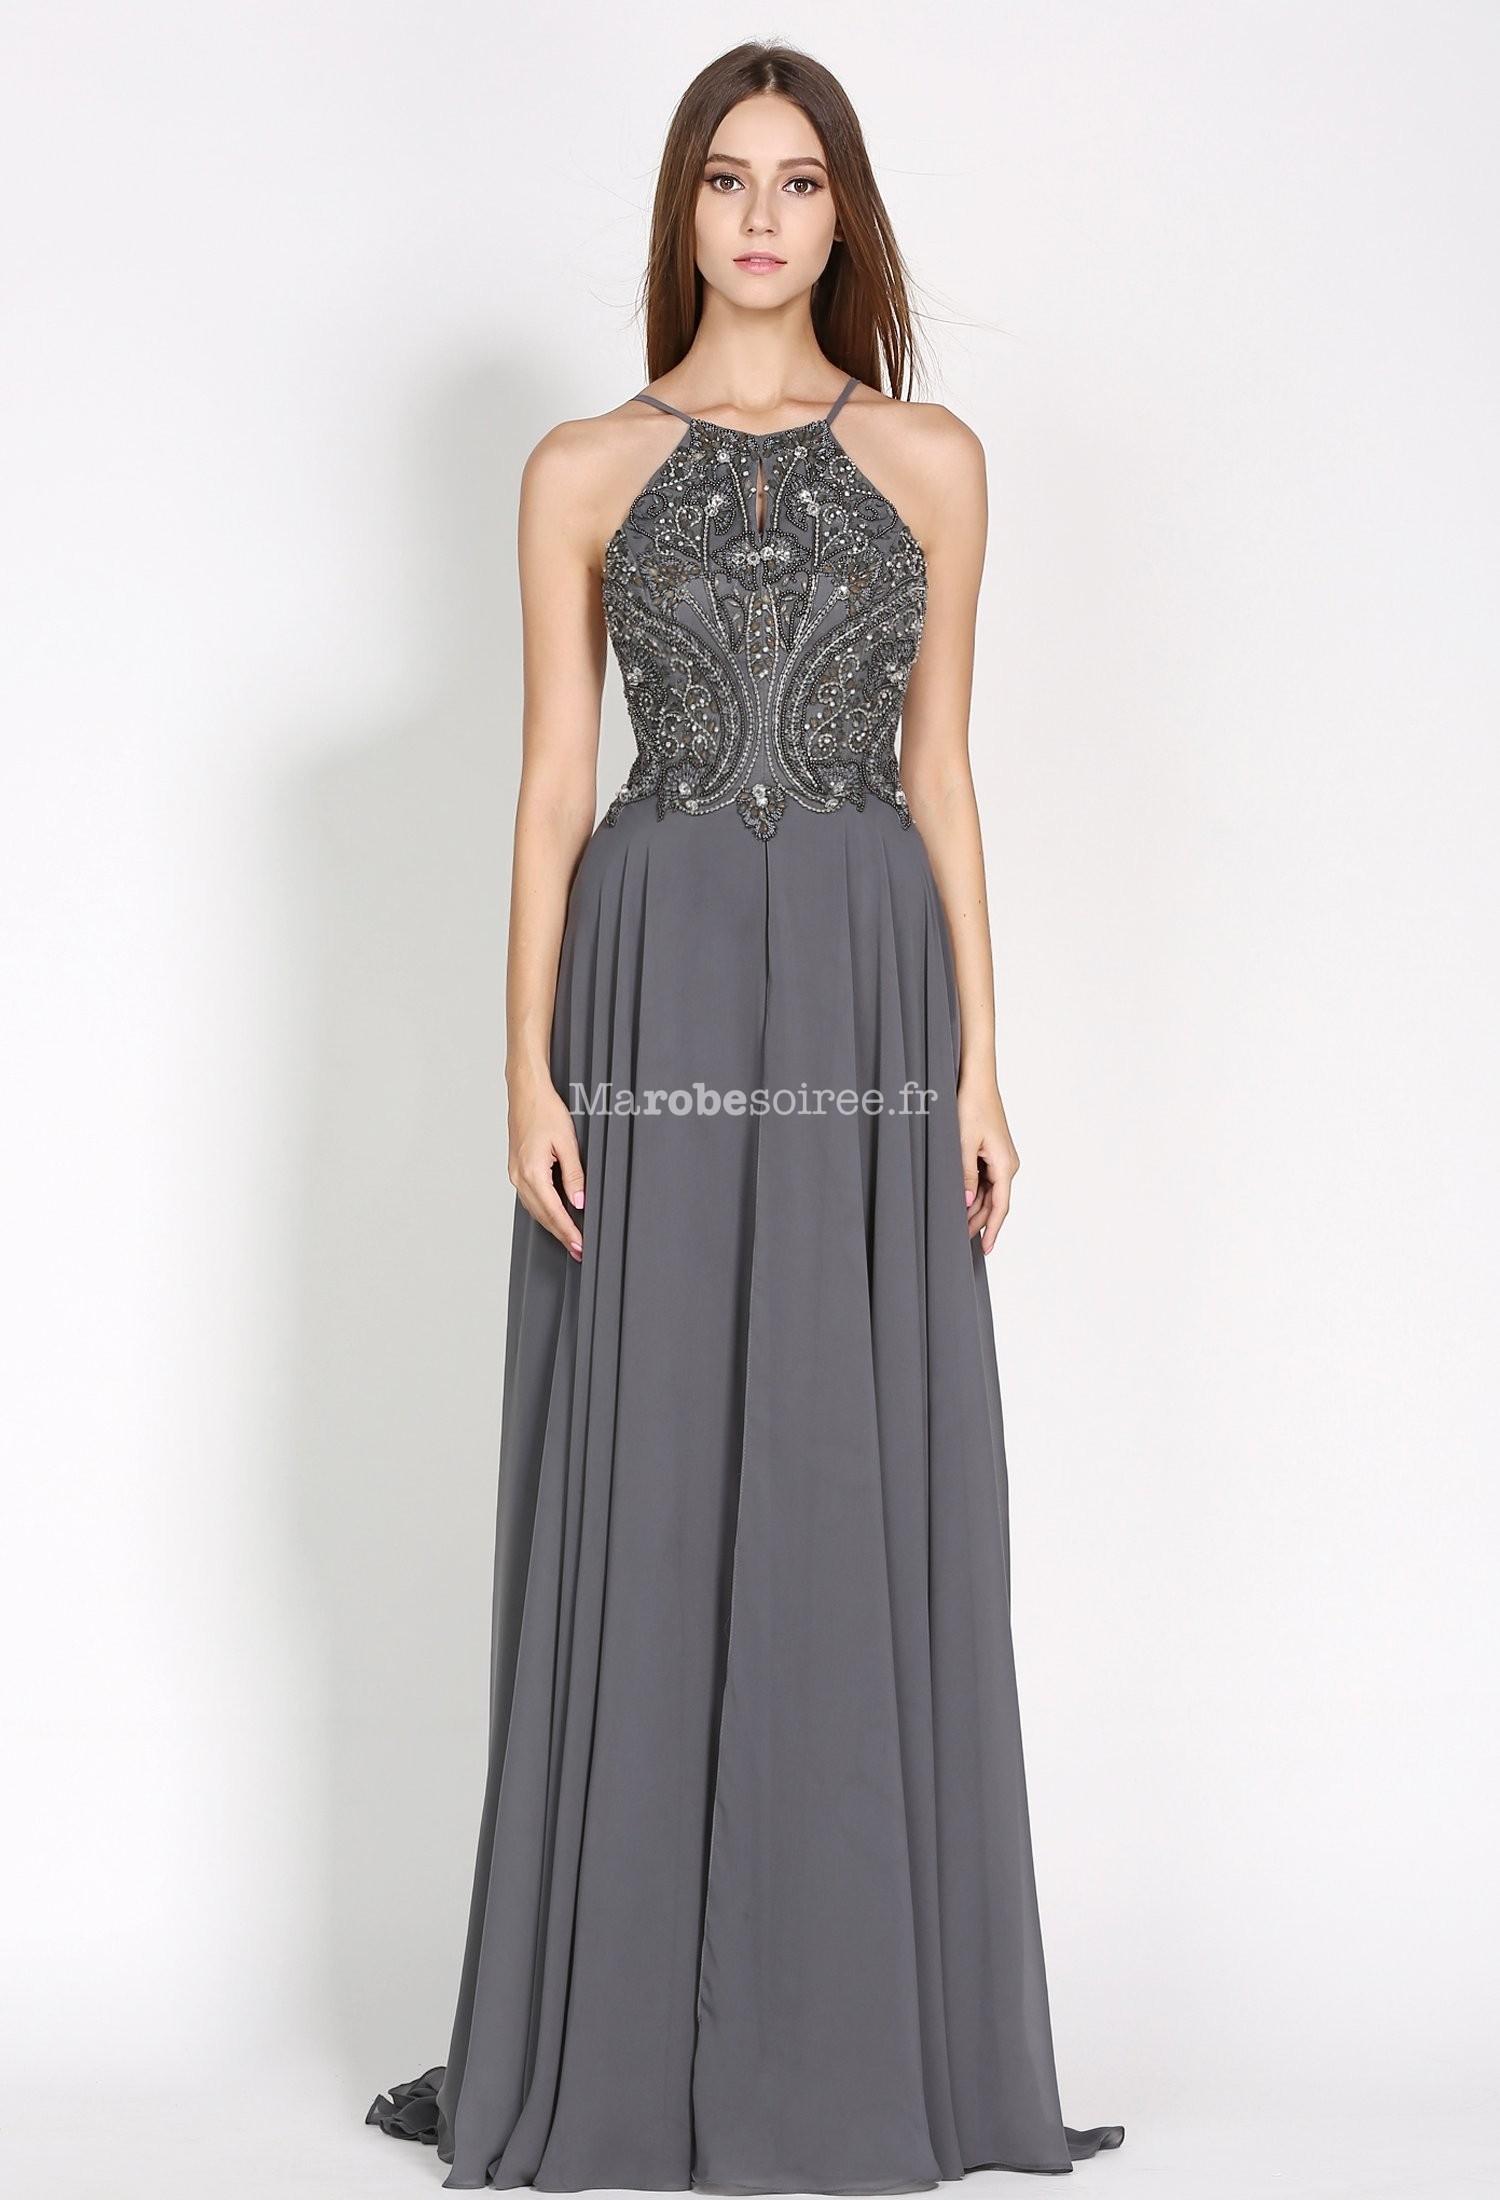 robe de soiree longuz robe de gala longue homme pas cher sexy femme robe de soiree bal col v longue. Black Bedroom Furniture Sets. Home Design Ideas